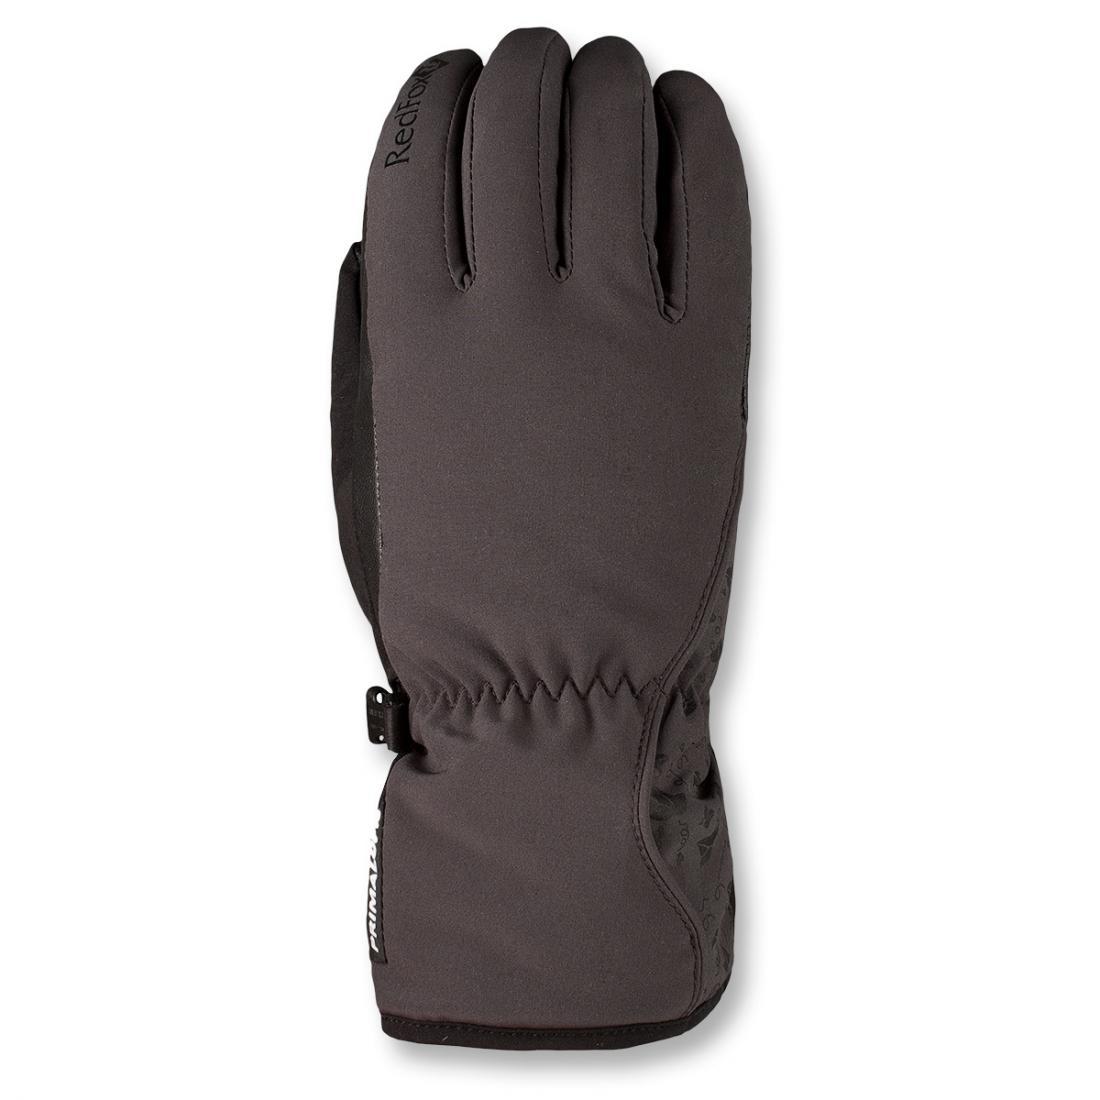 Перчатки женские RozaryПерчатки<br><br> Женская версия зимних прогулочных перчаток с утеплителем Primaloft®.<br><br><br> <br><br><br><br><br> Материал – Nylon DWR.<br><br> <br><br><br> Утеплитель – Primaloft®.<br><br> <br><br><br> Вставки, препятствующ...<br><br>Цвет: Черный<br>Размер: M